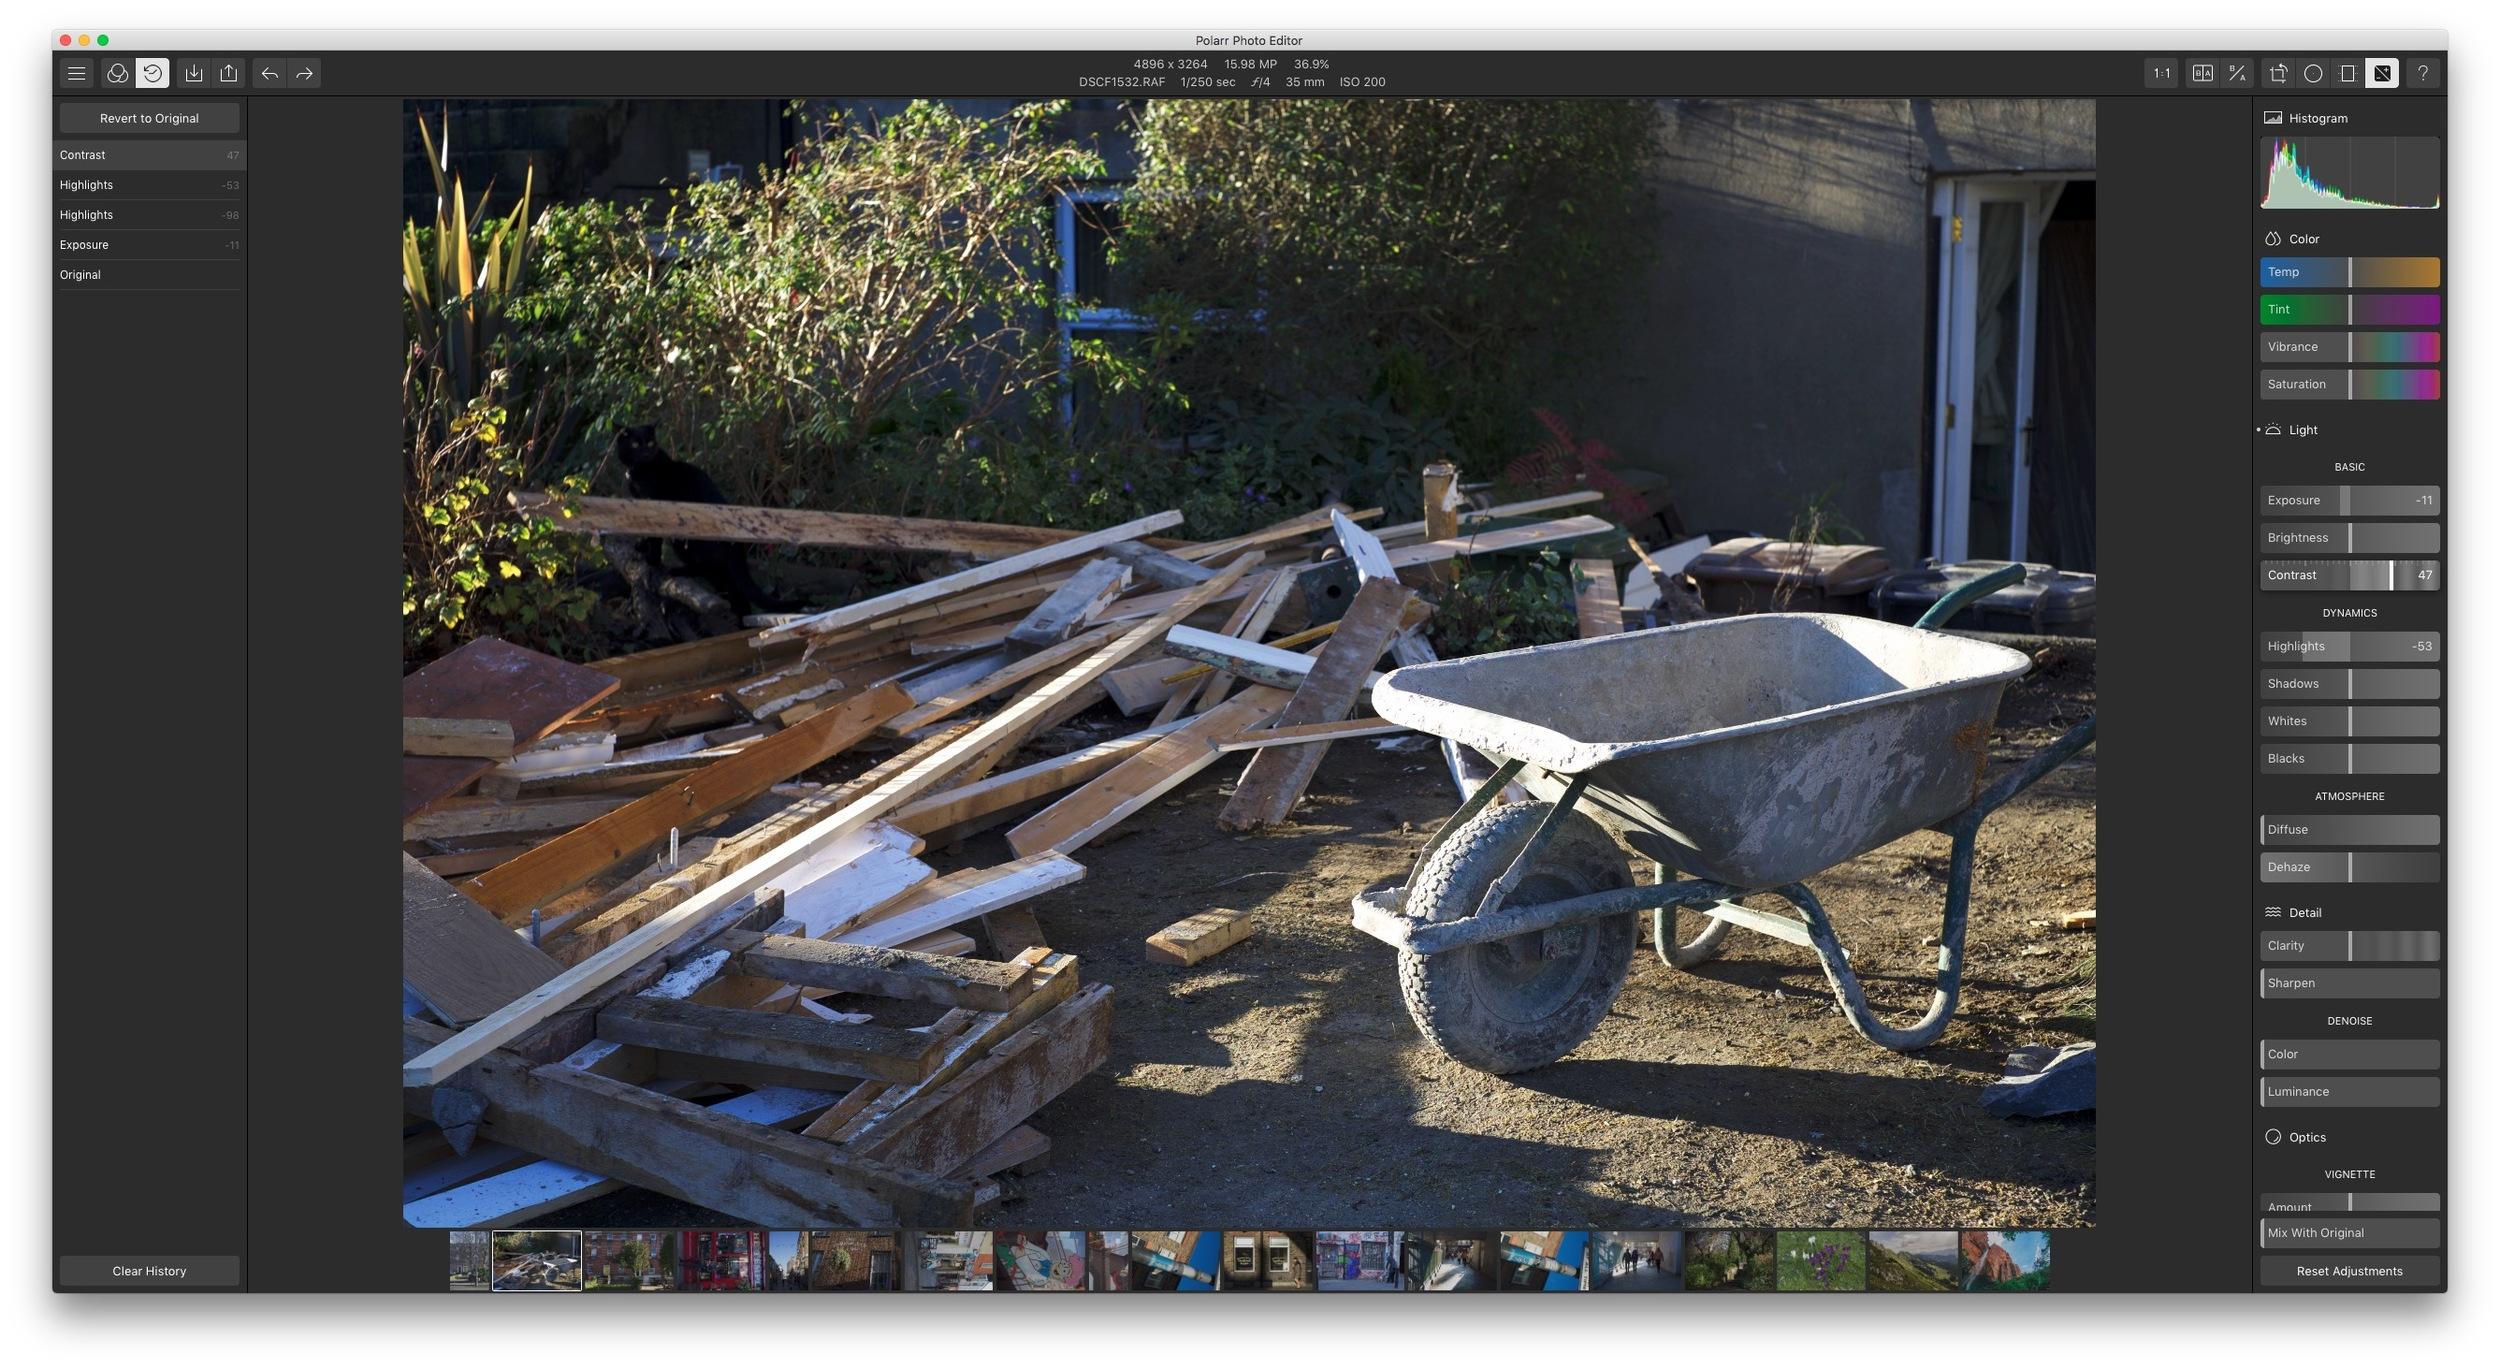 Polarr Photo Editor with Fuji X-Trans File